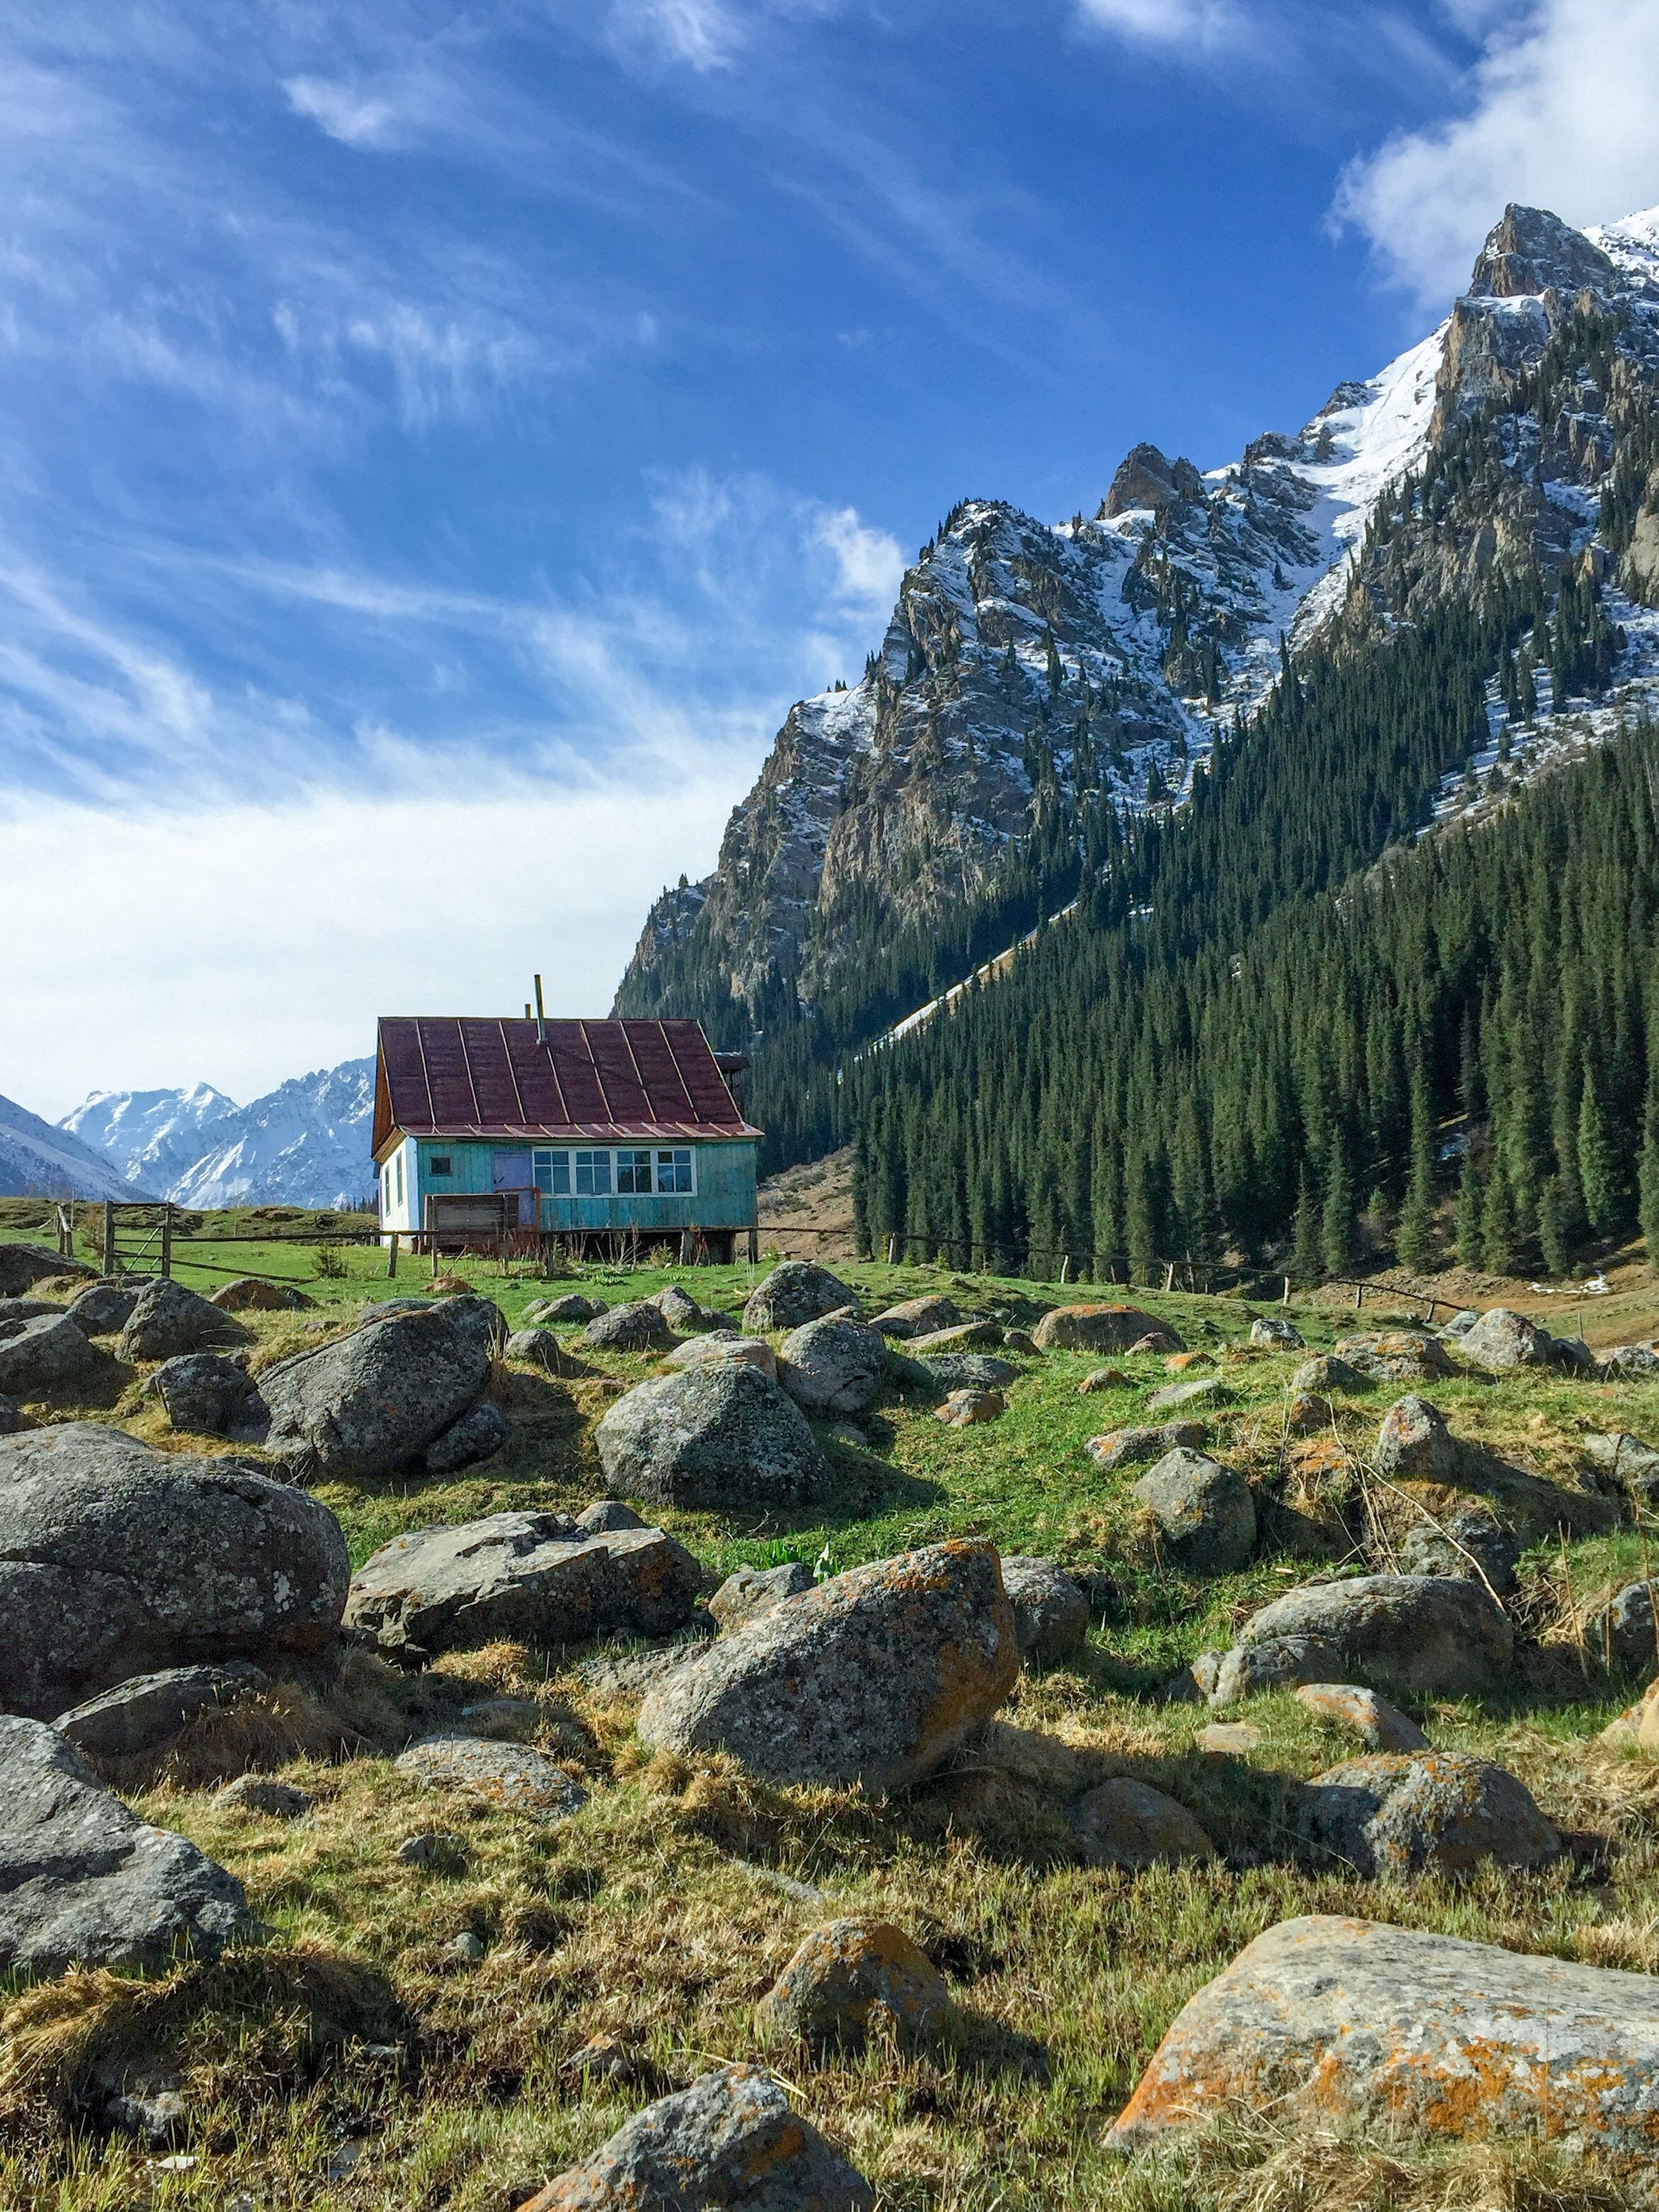 Lonely Home in Altyn Arashan, Kyrgyzstan